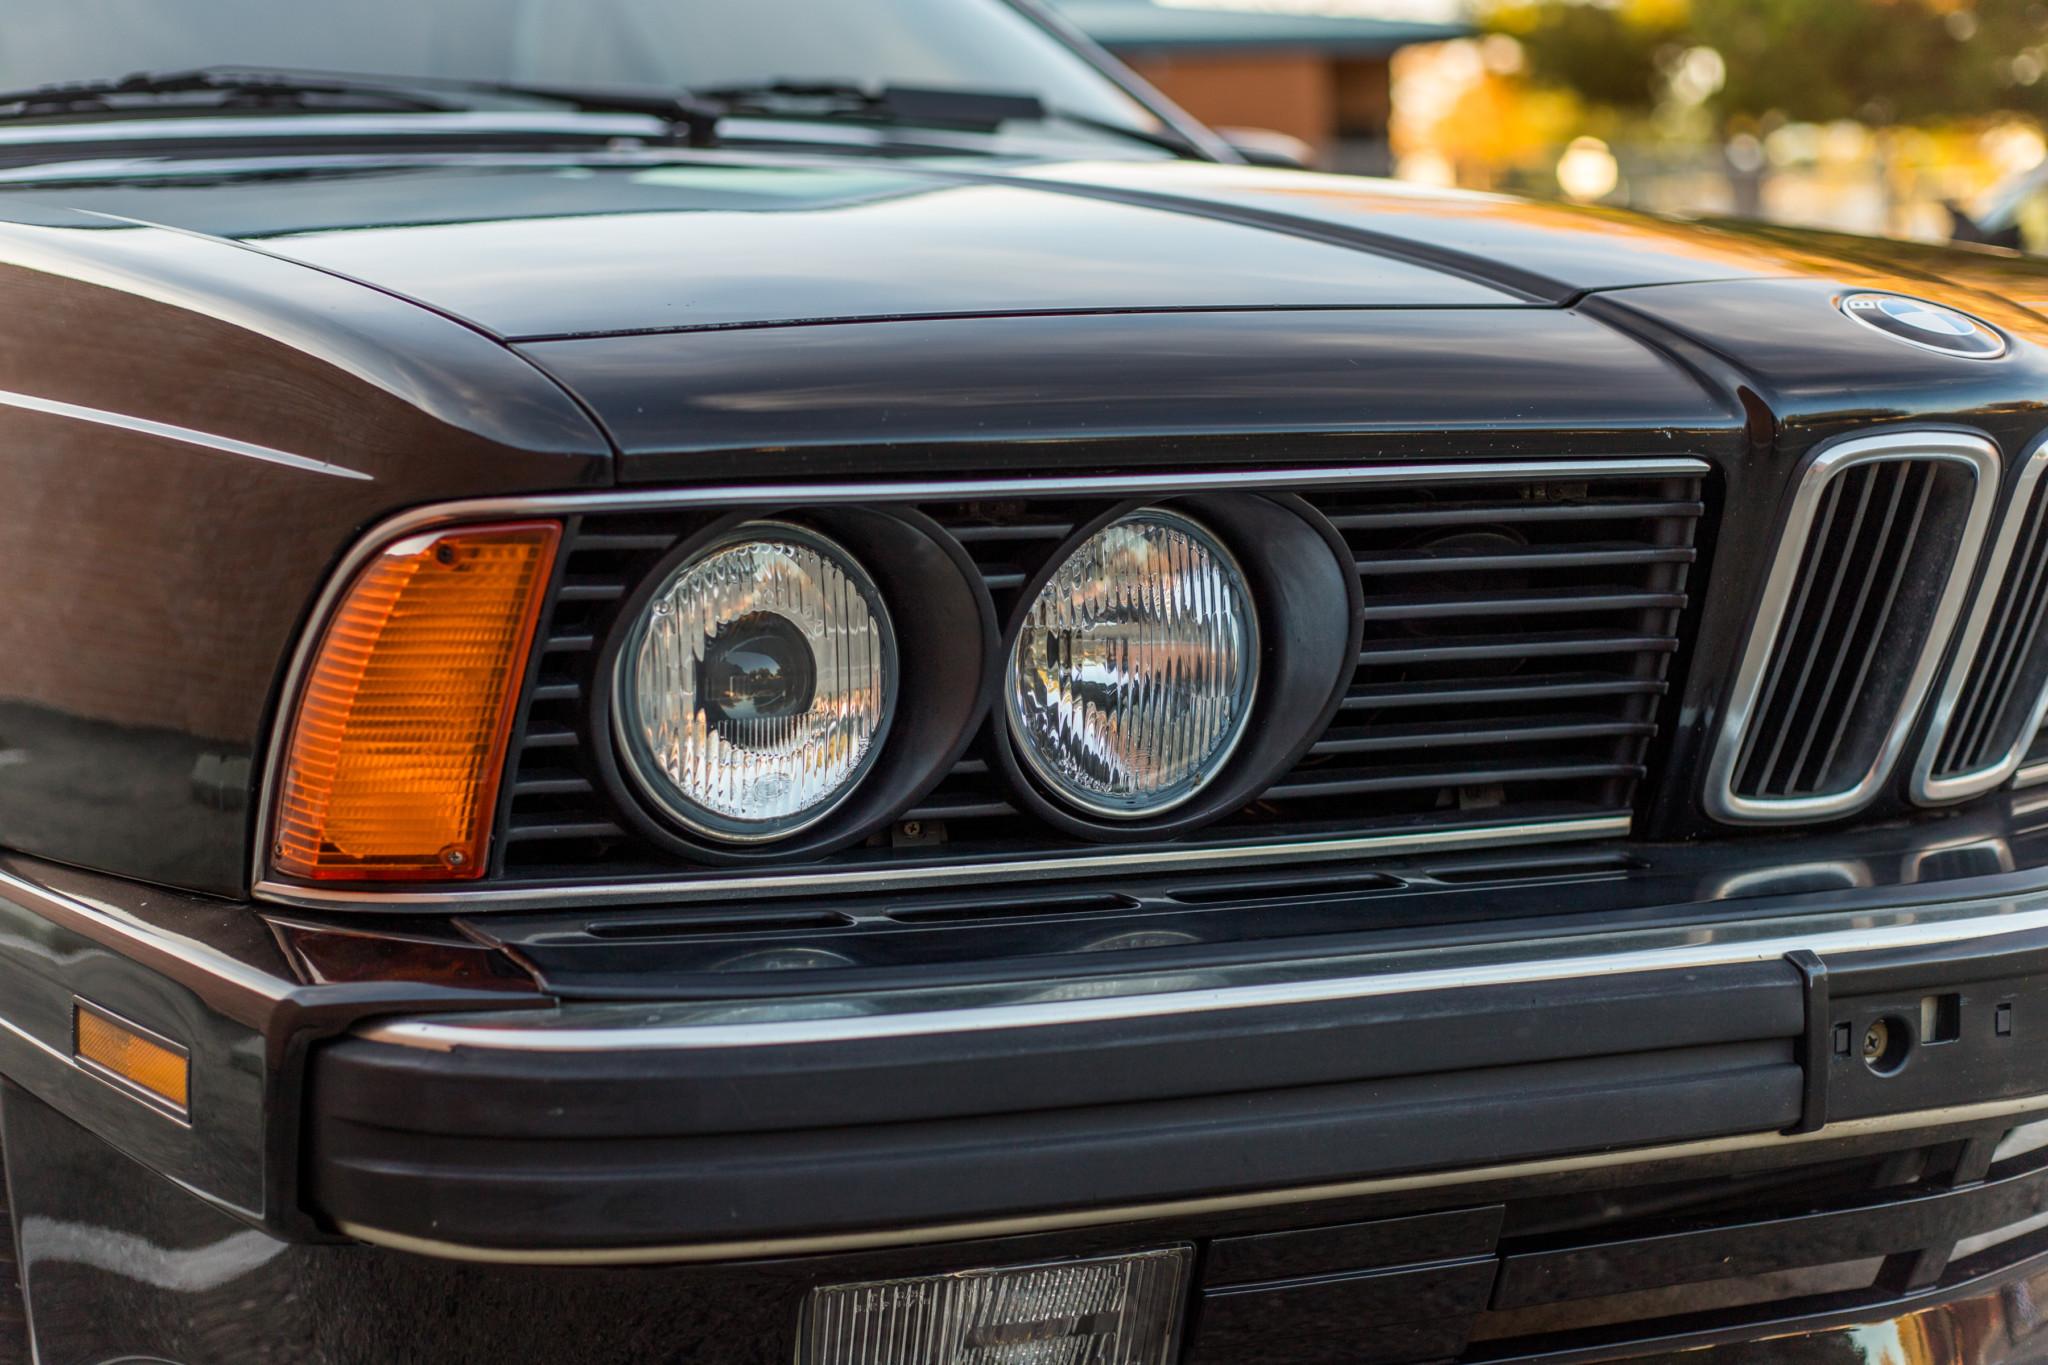 1988 bmw M6 kent classic cars (19).jpg